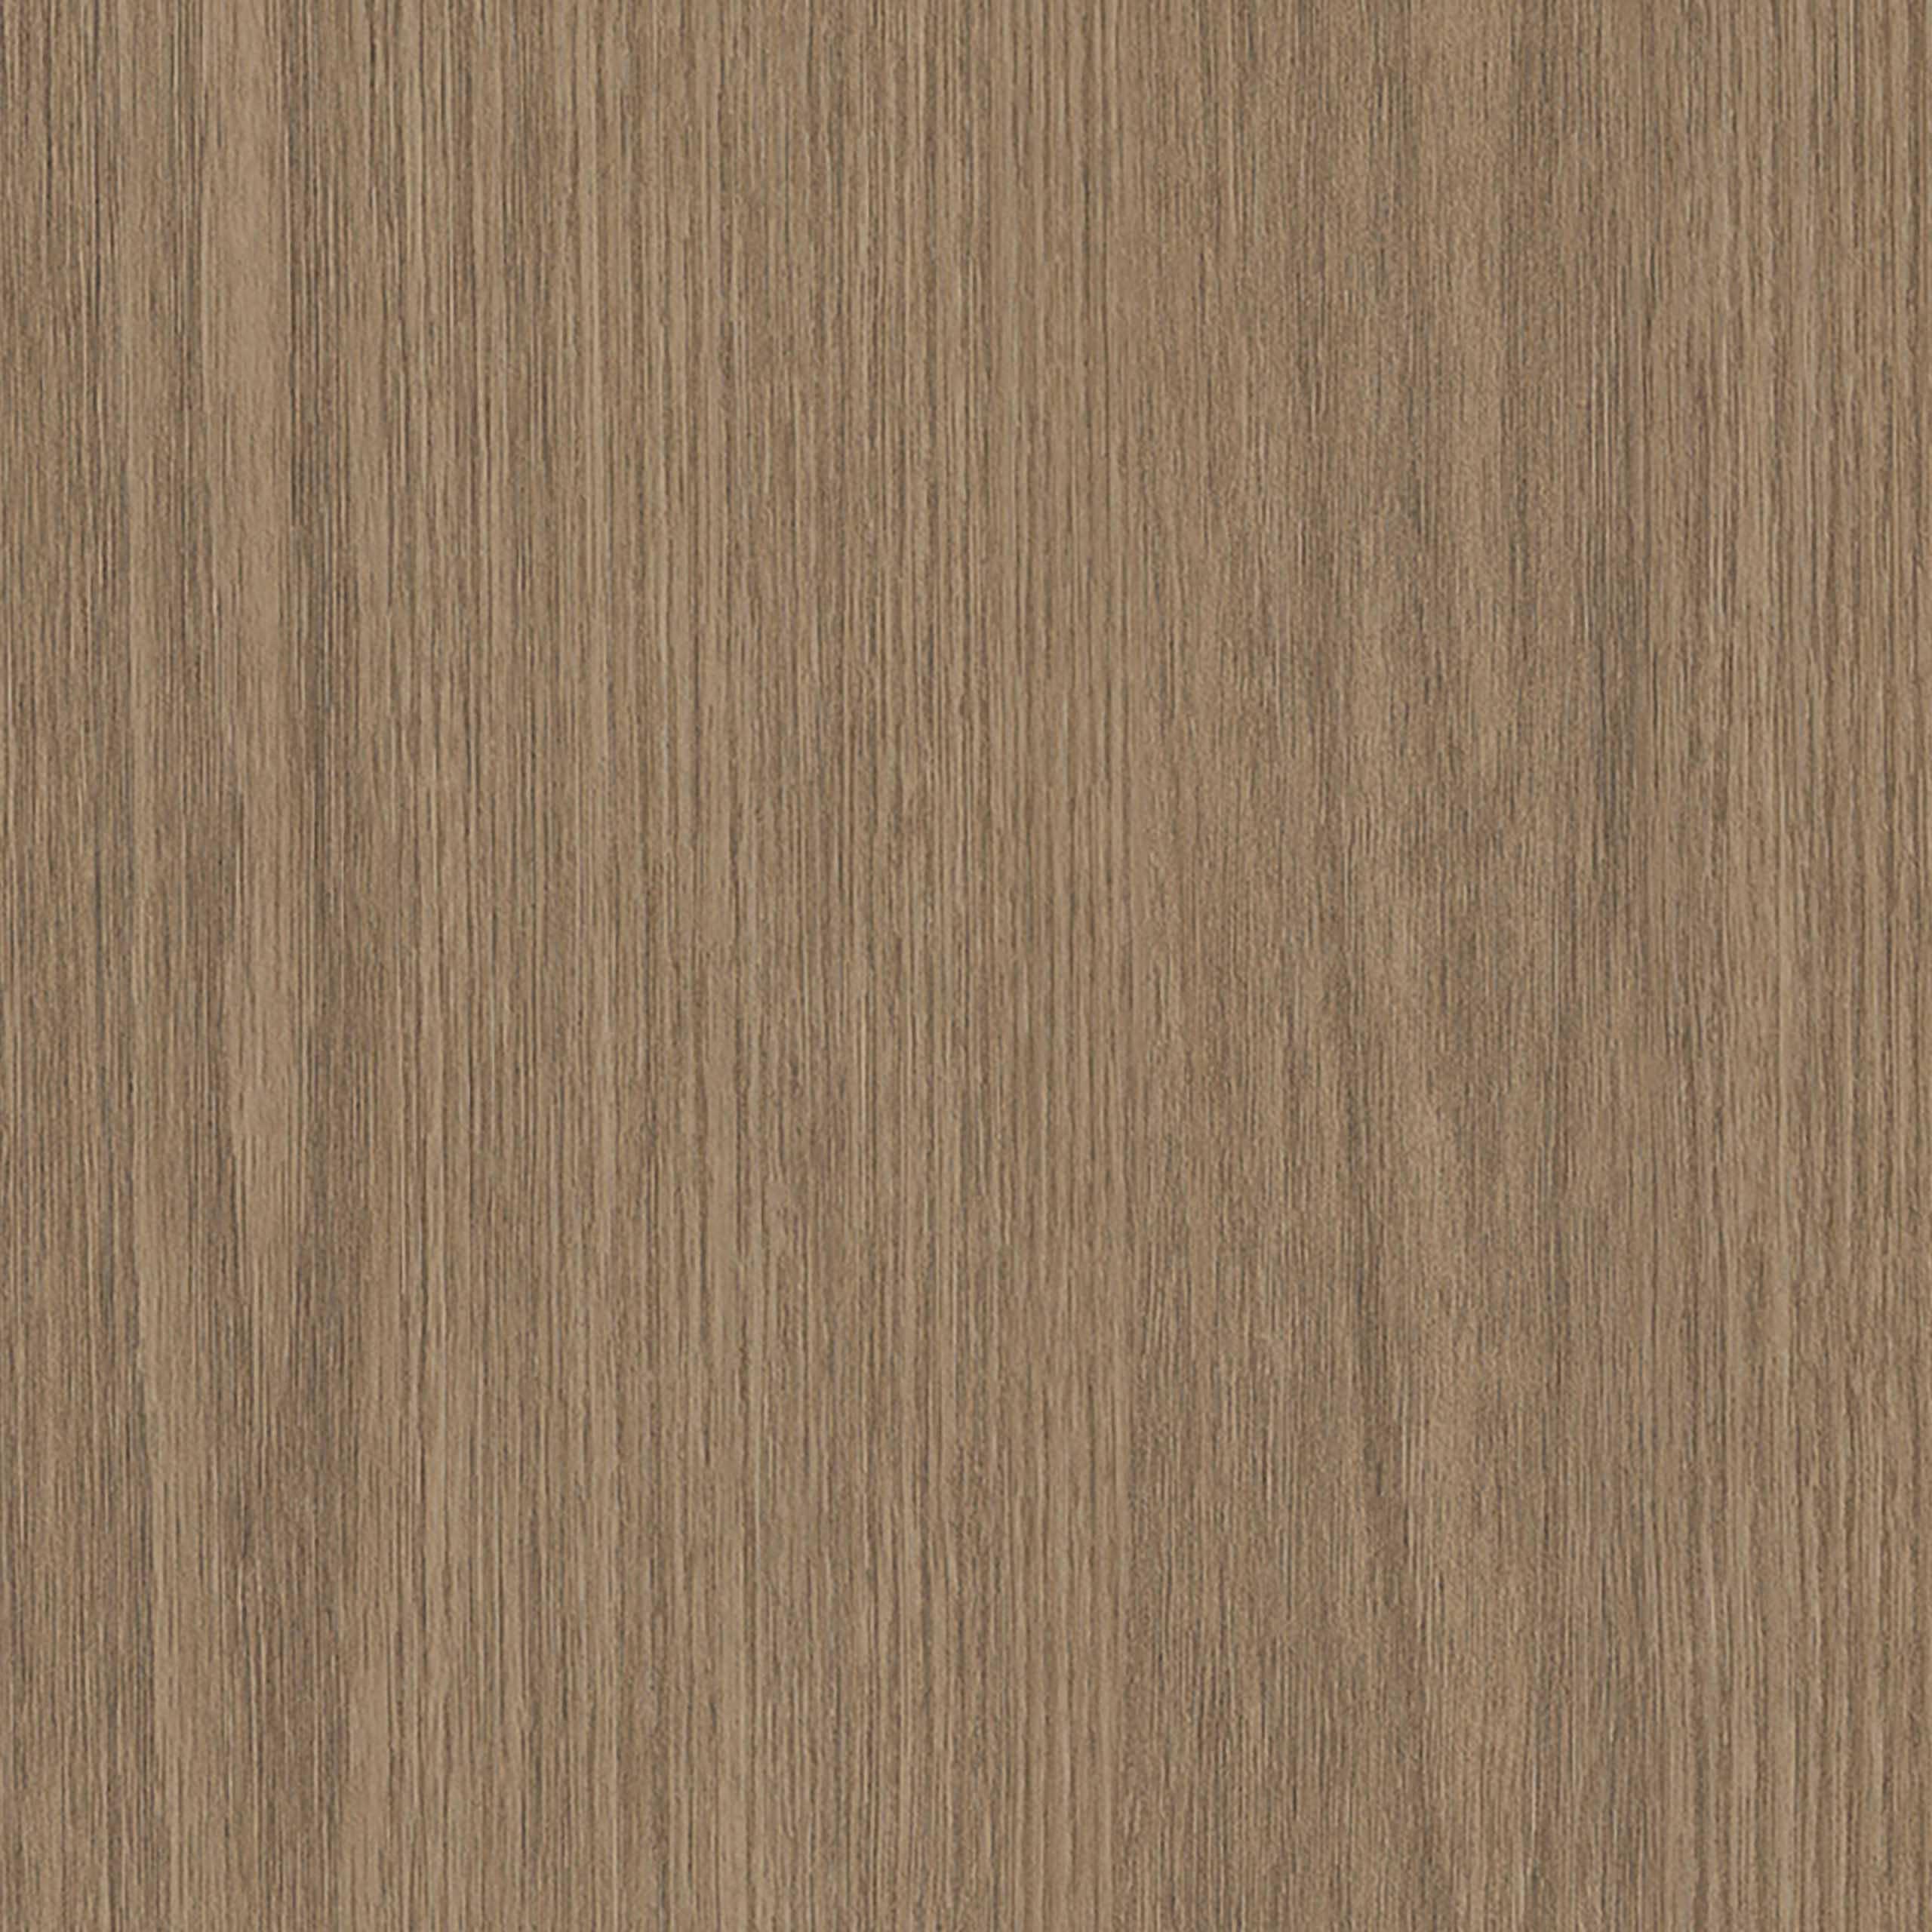 AZ07 Light golden oak